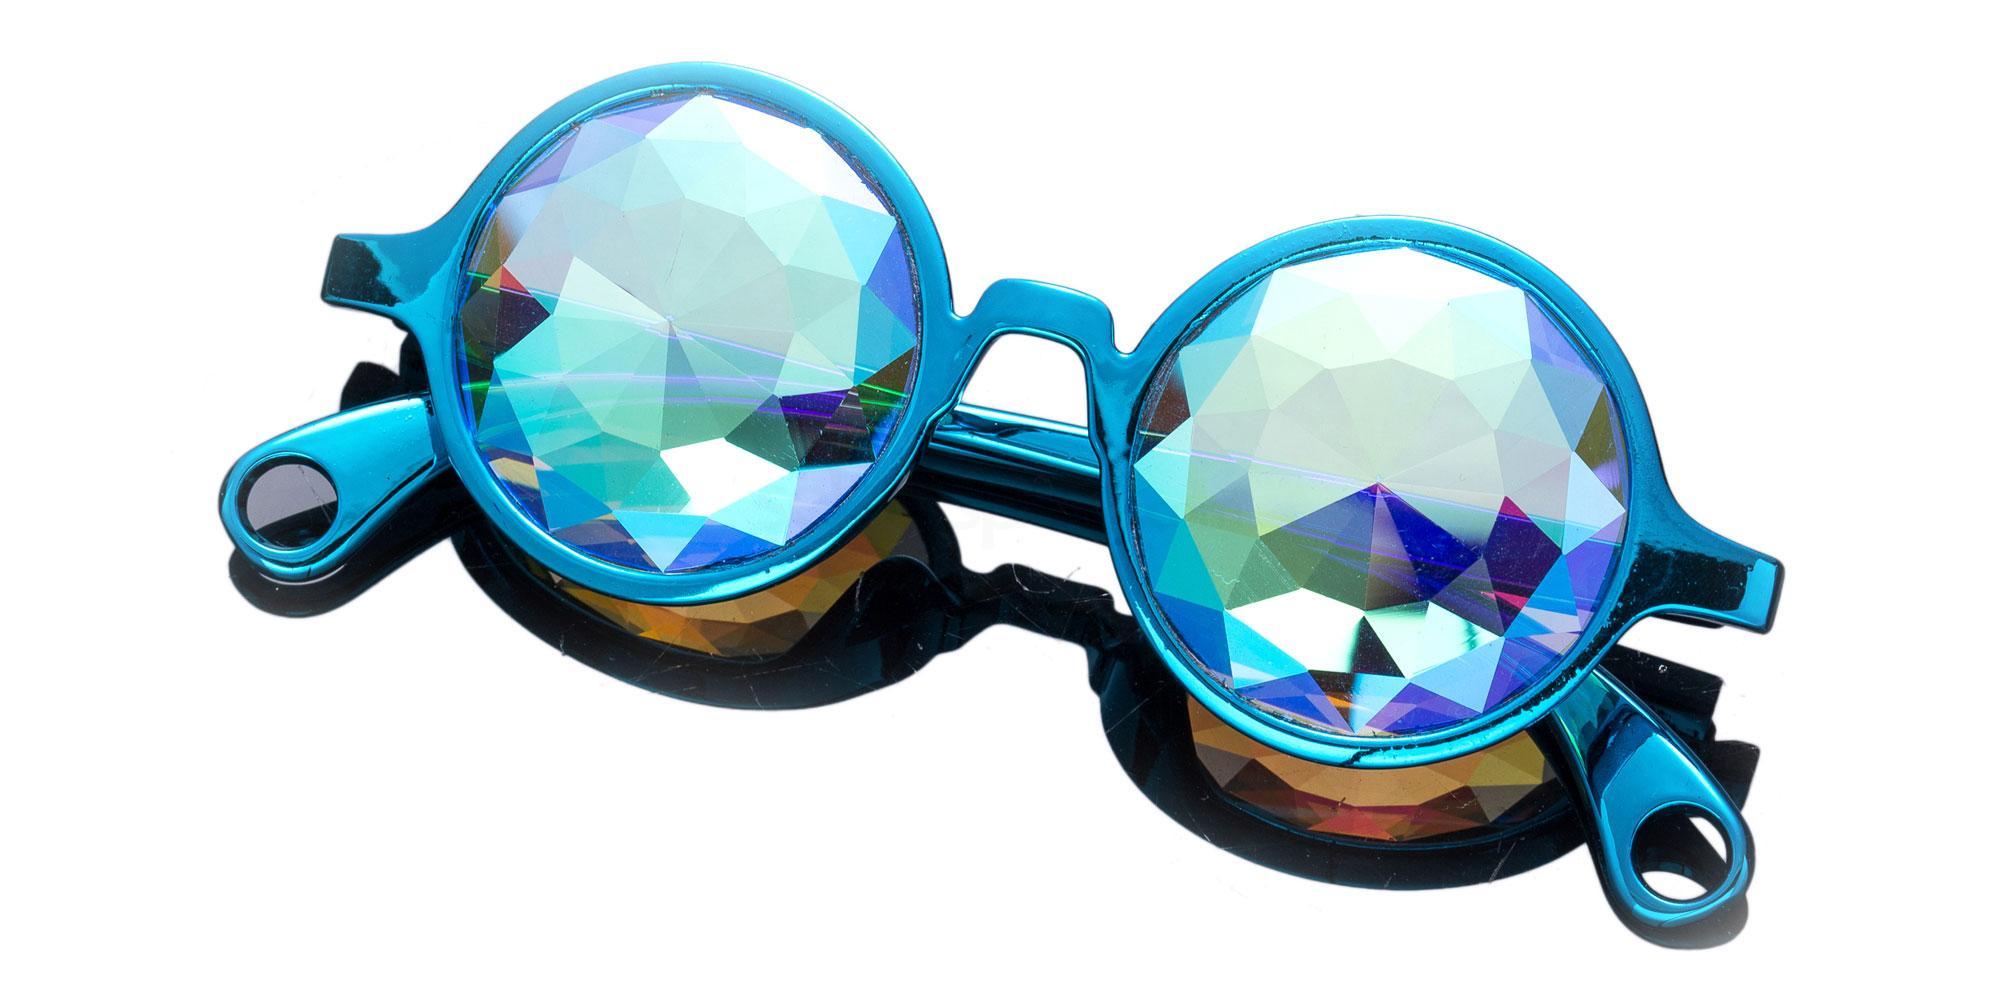 Green Round Style Frame / Small Diamond Rainbow Lense 1004K-23 Accessories, Kolor Kaleido